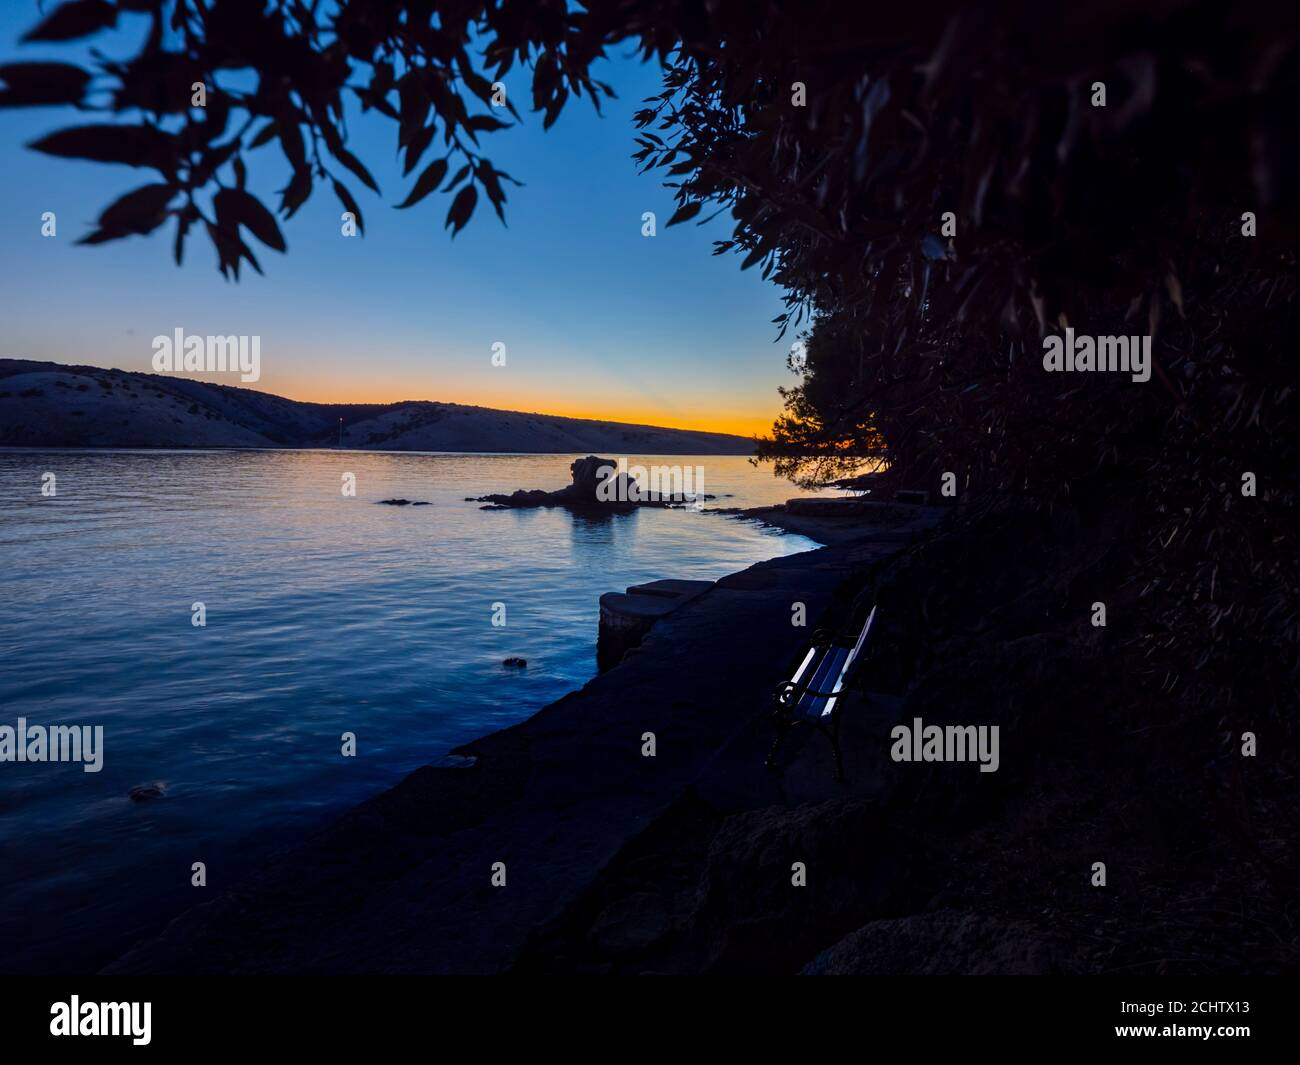 Famous rocks rock landmark and promenade in Lopar on Rab island Croatia Europe picturesque peaceful tranquility panoramic atmospheric zen dusk evening Stock Photo